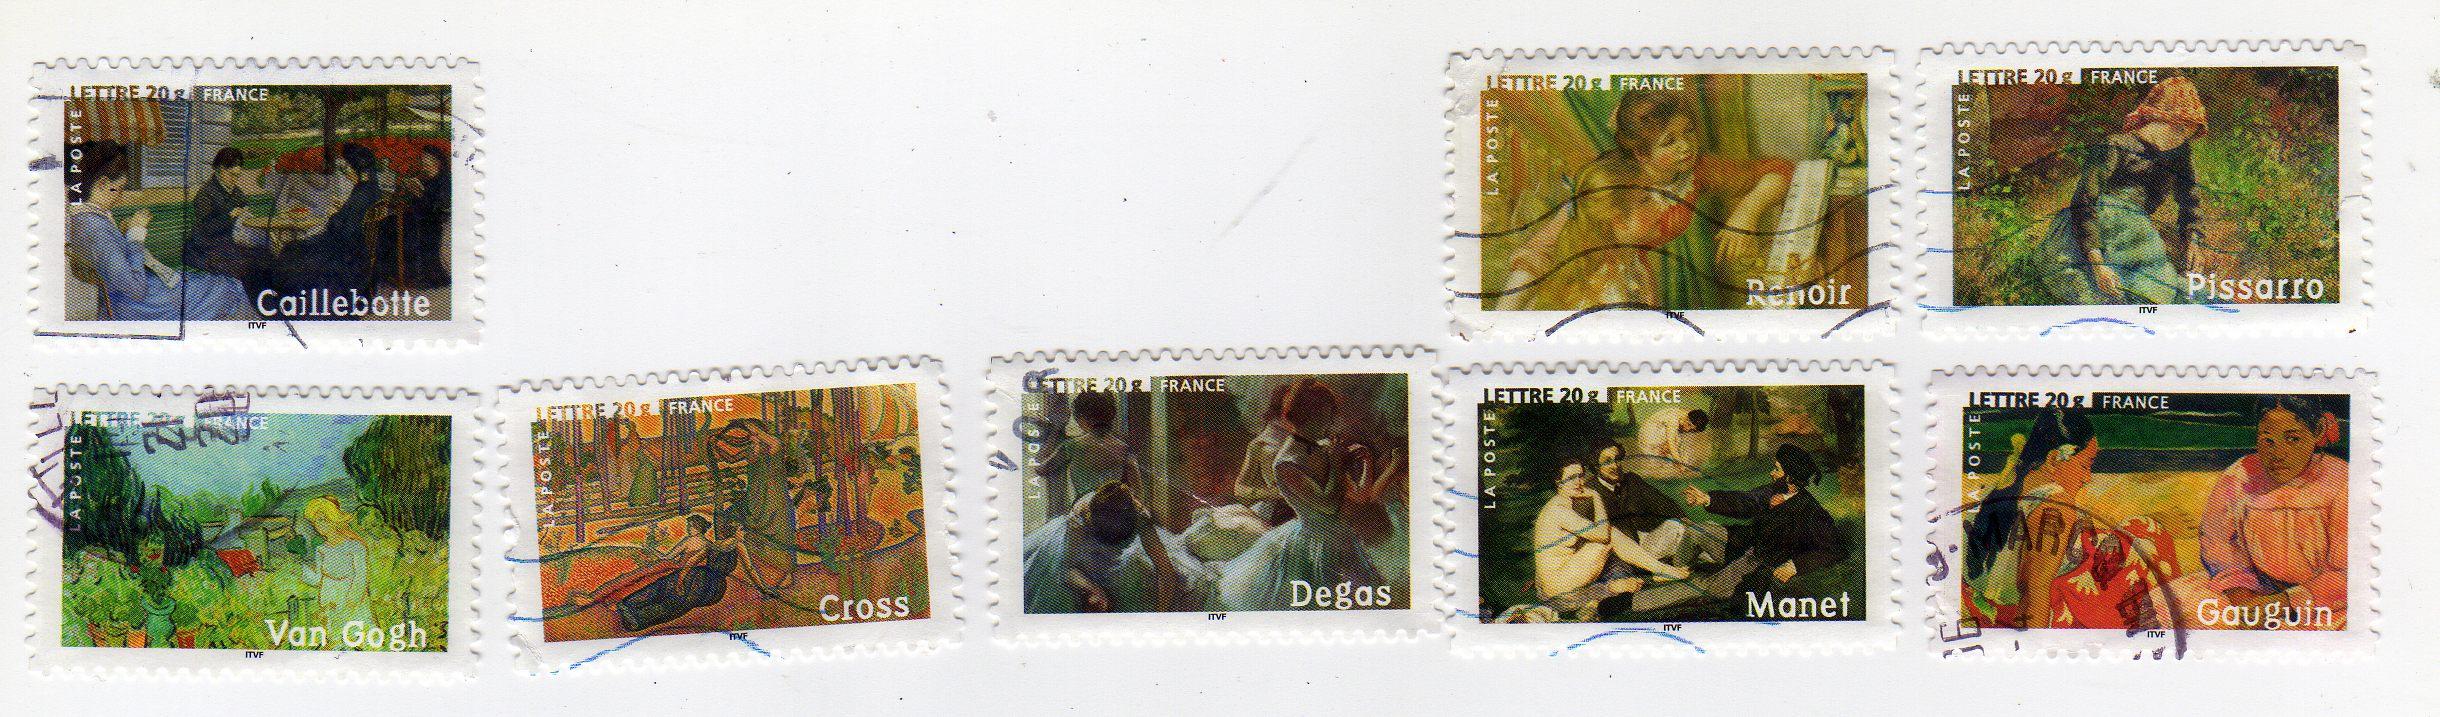 2010-timbre